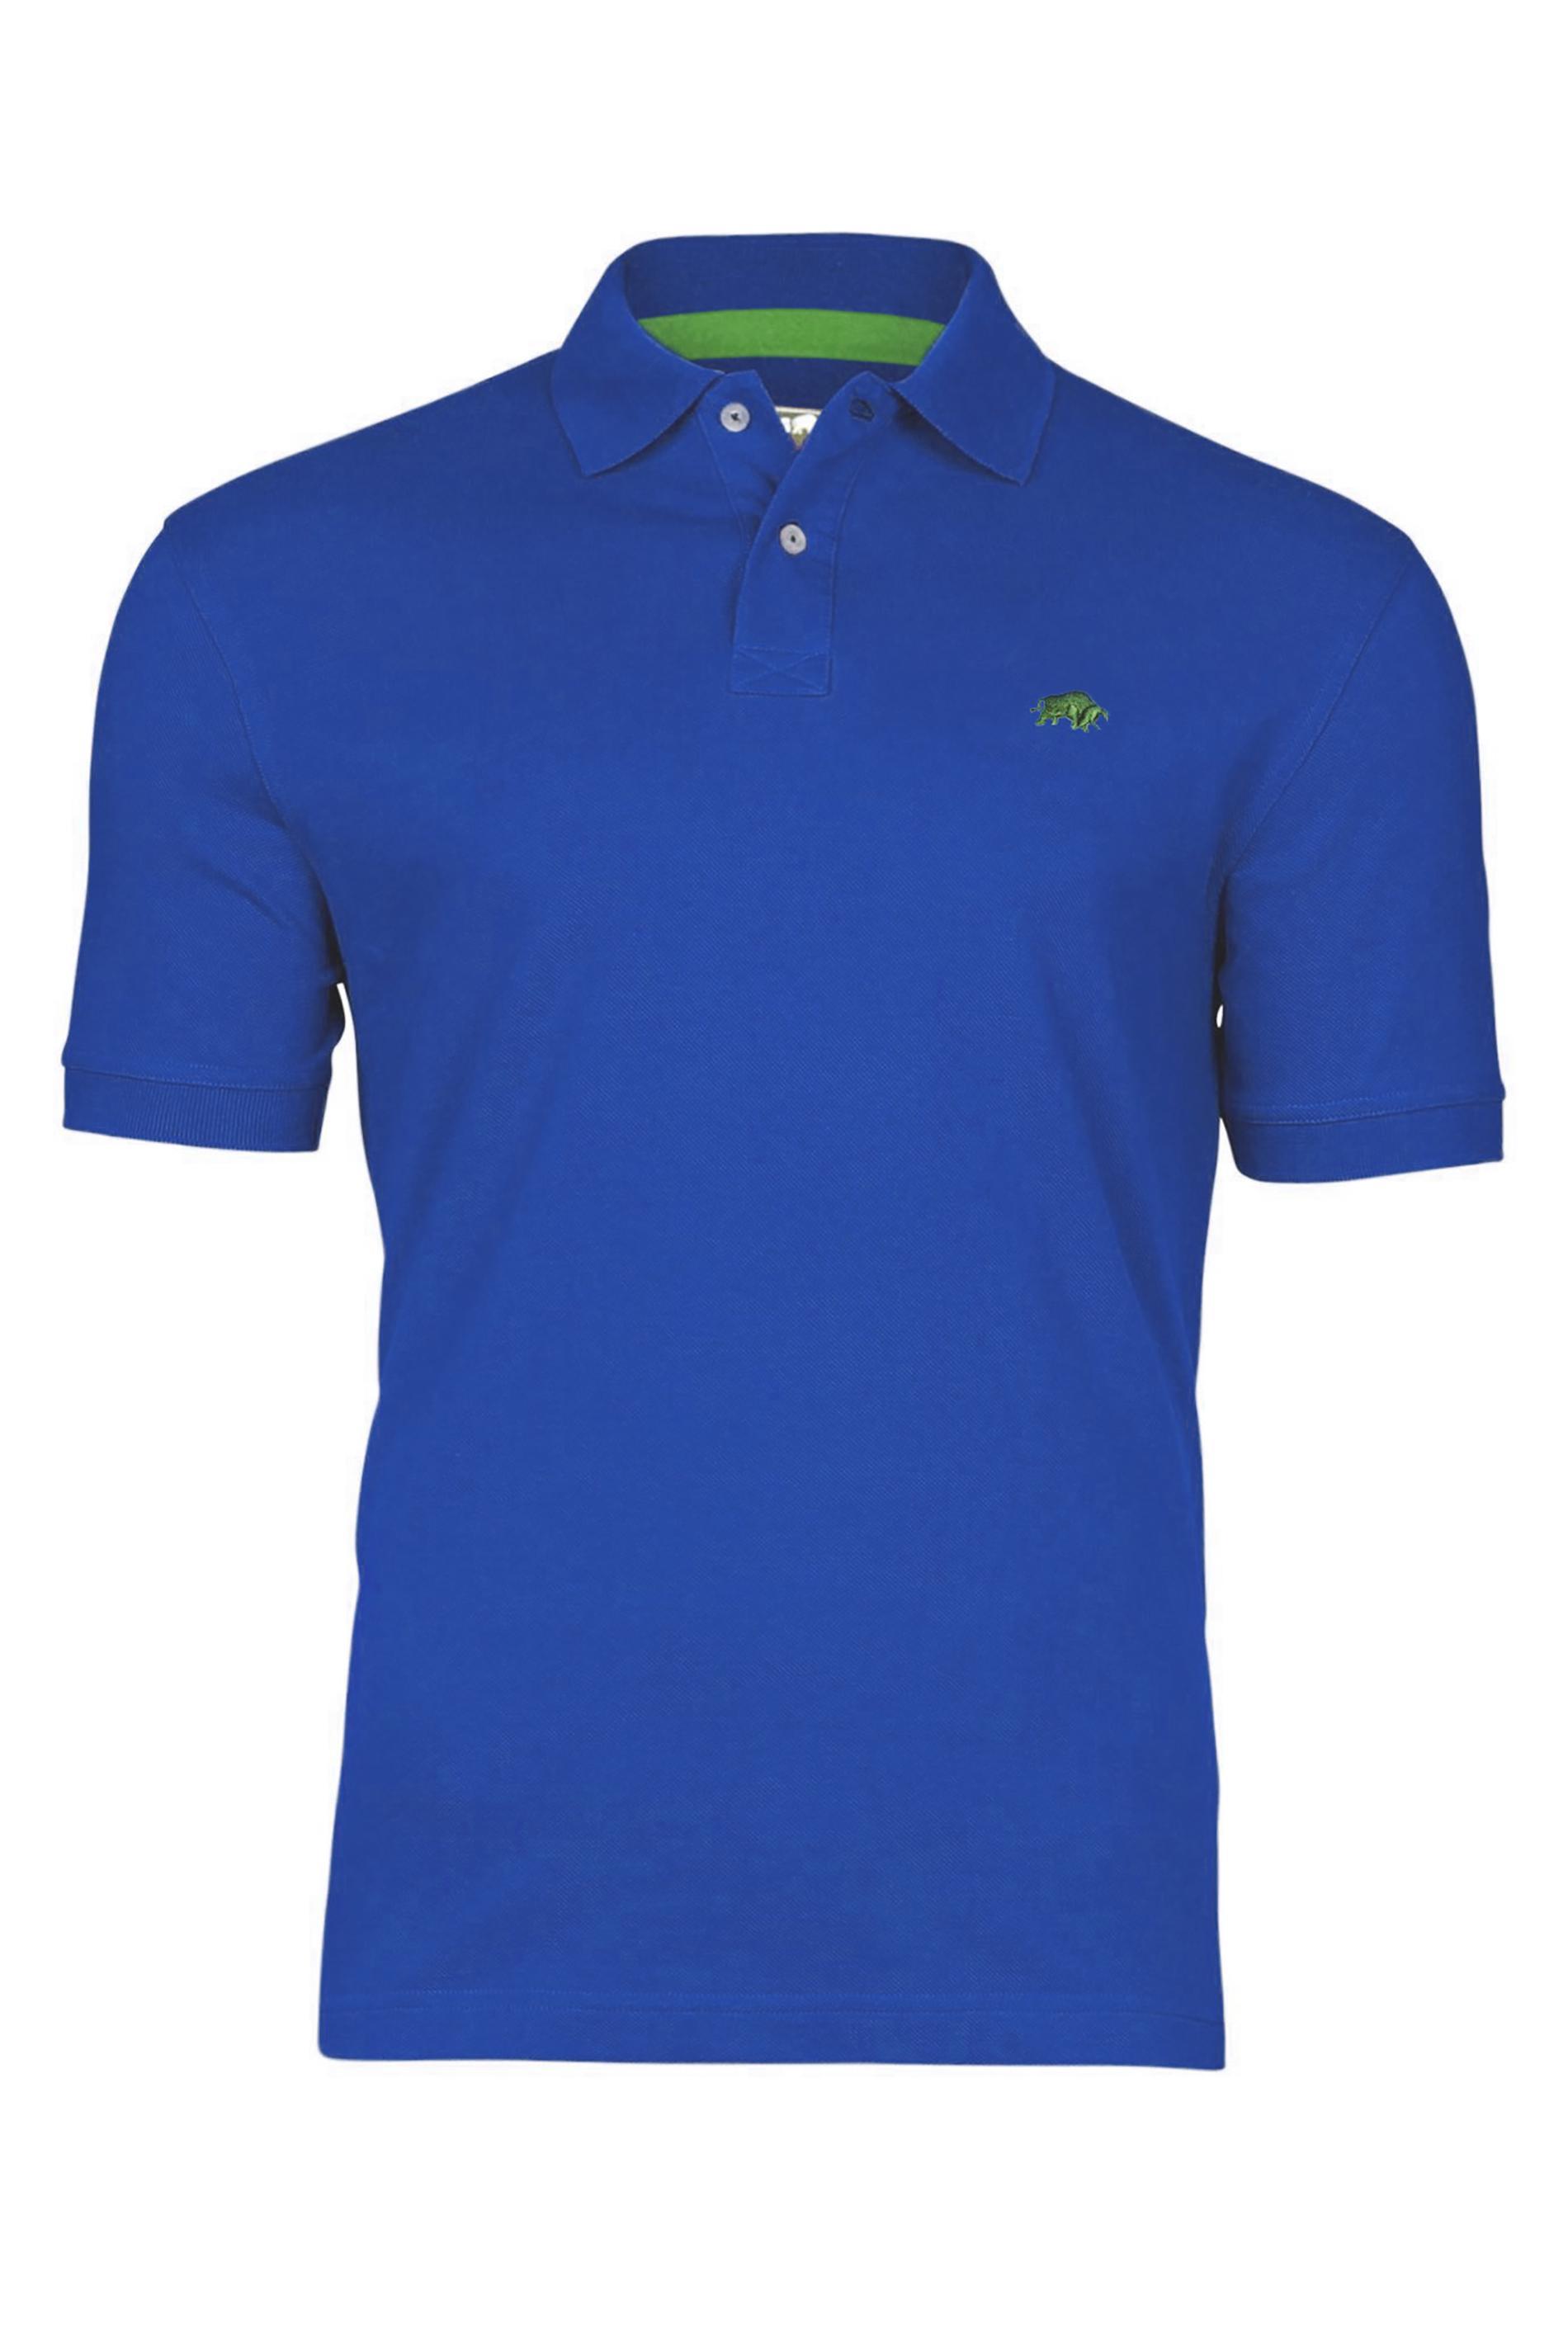 RAGING BULL Cobalt Blue Signature Pique Polo Shirt_f.jpg